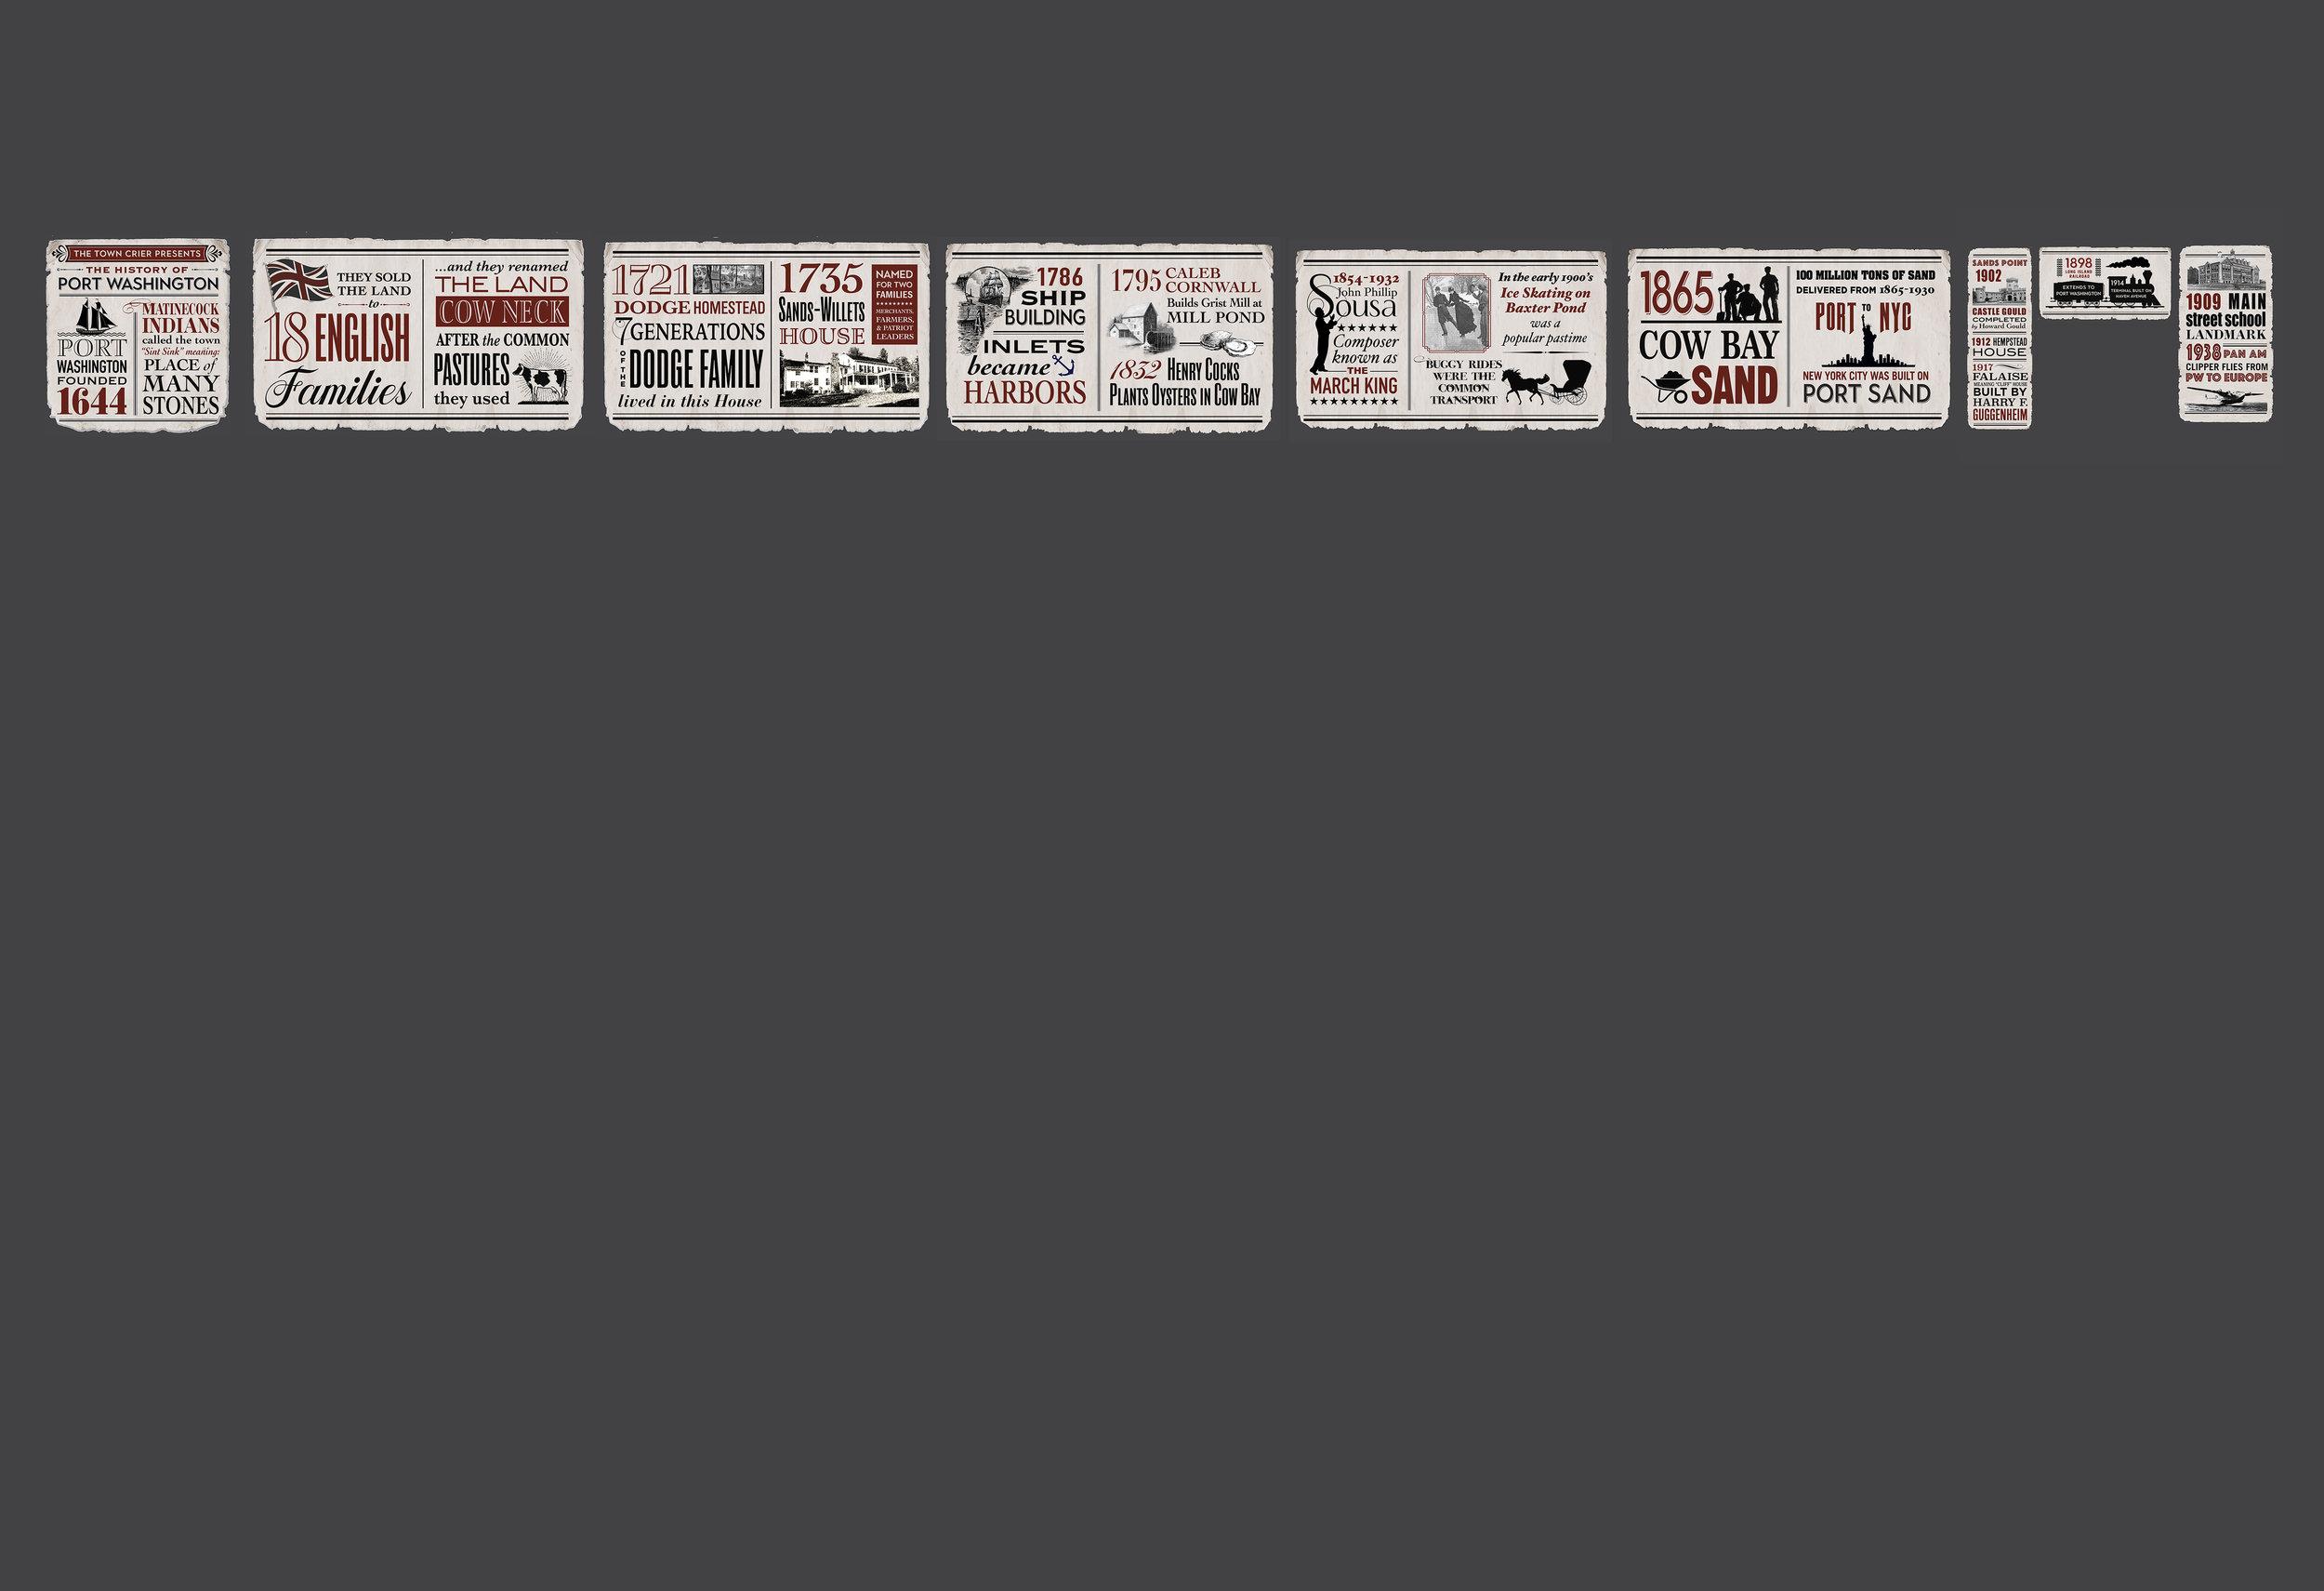 10_30_18_HPW_Complete wall.jpg